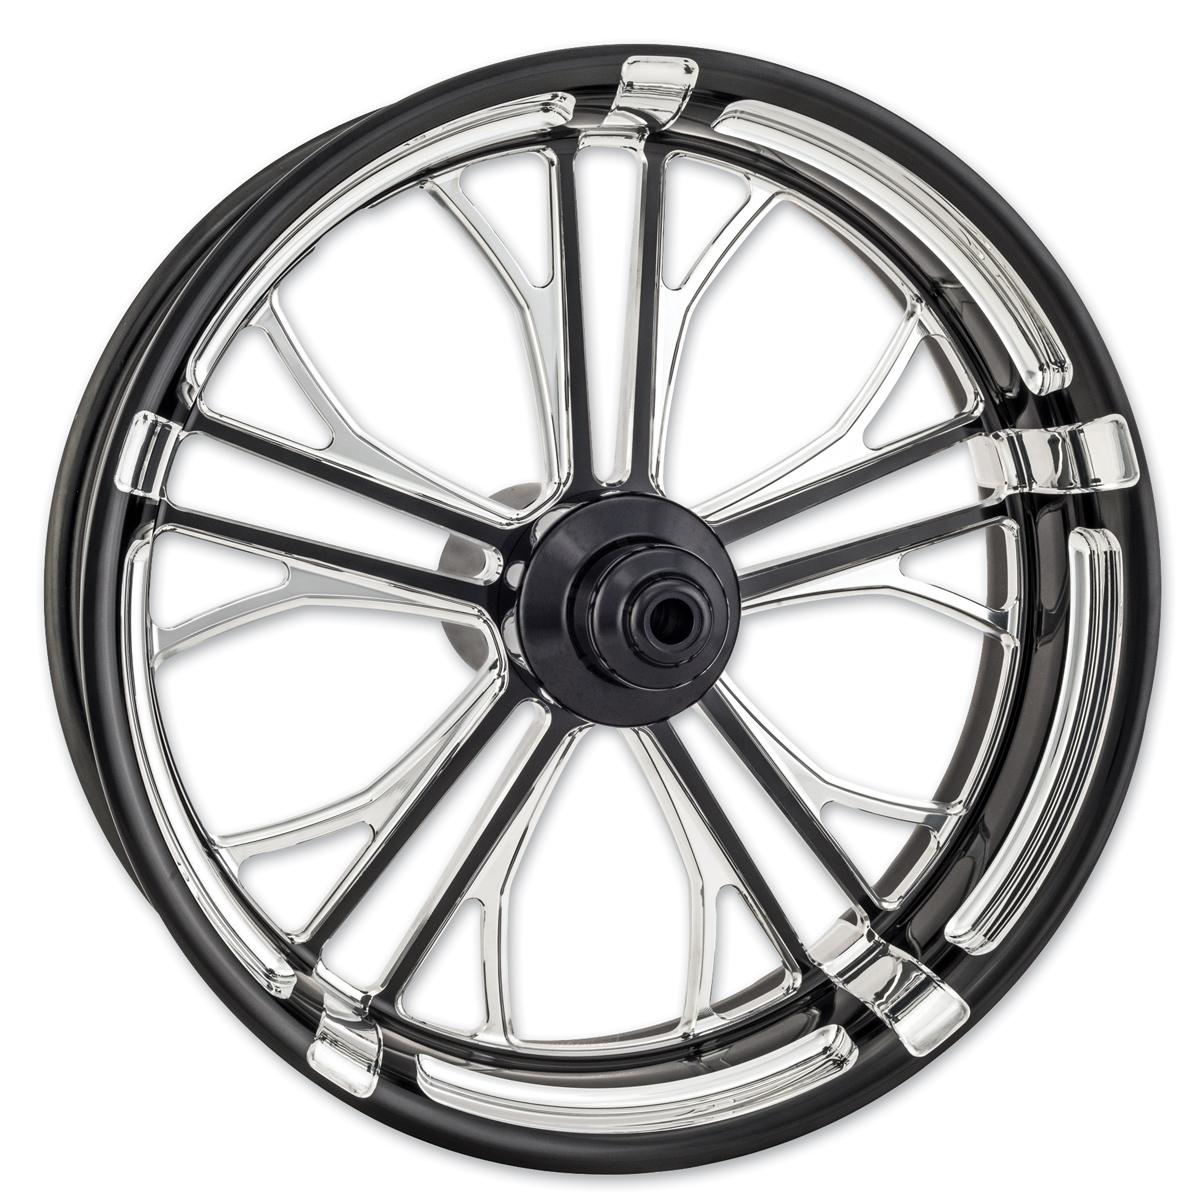 Performance Machine Dixon Platinum Cut Rear Wheel 18x4.25